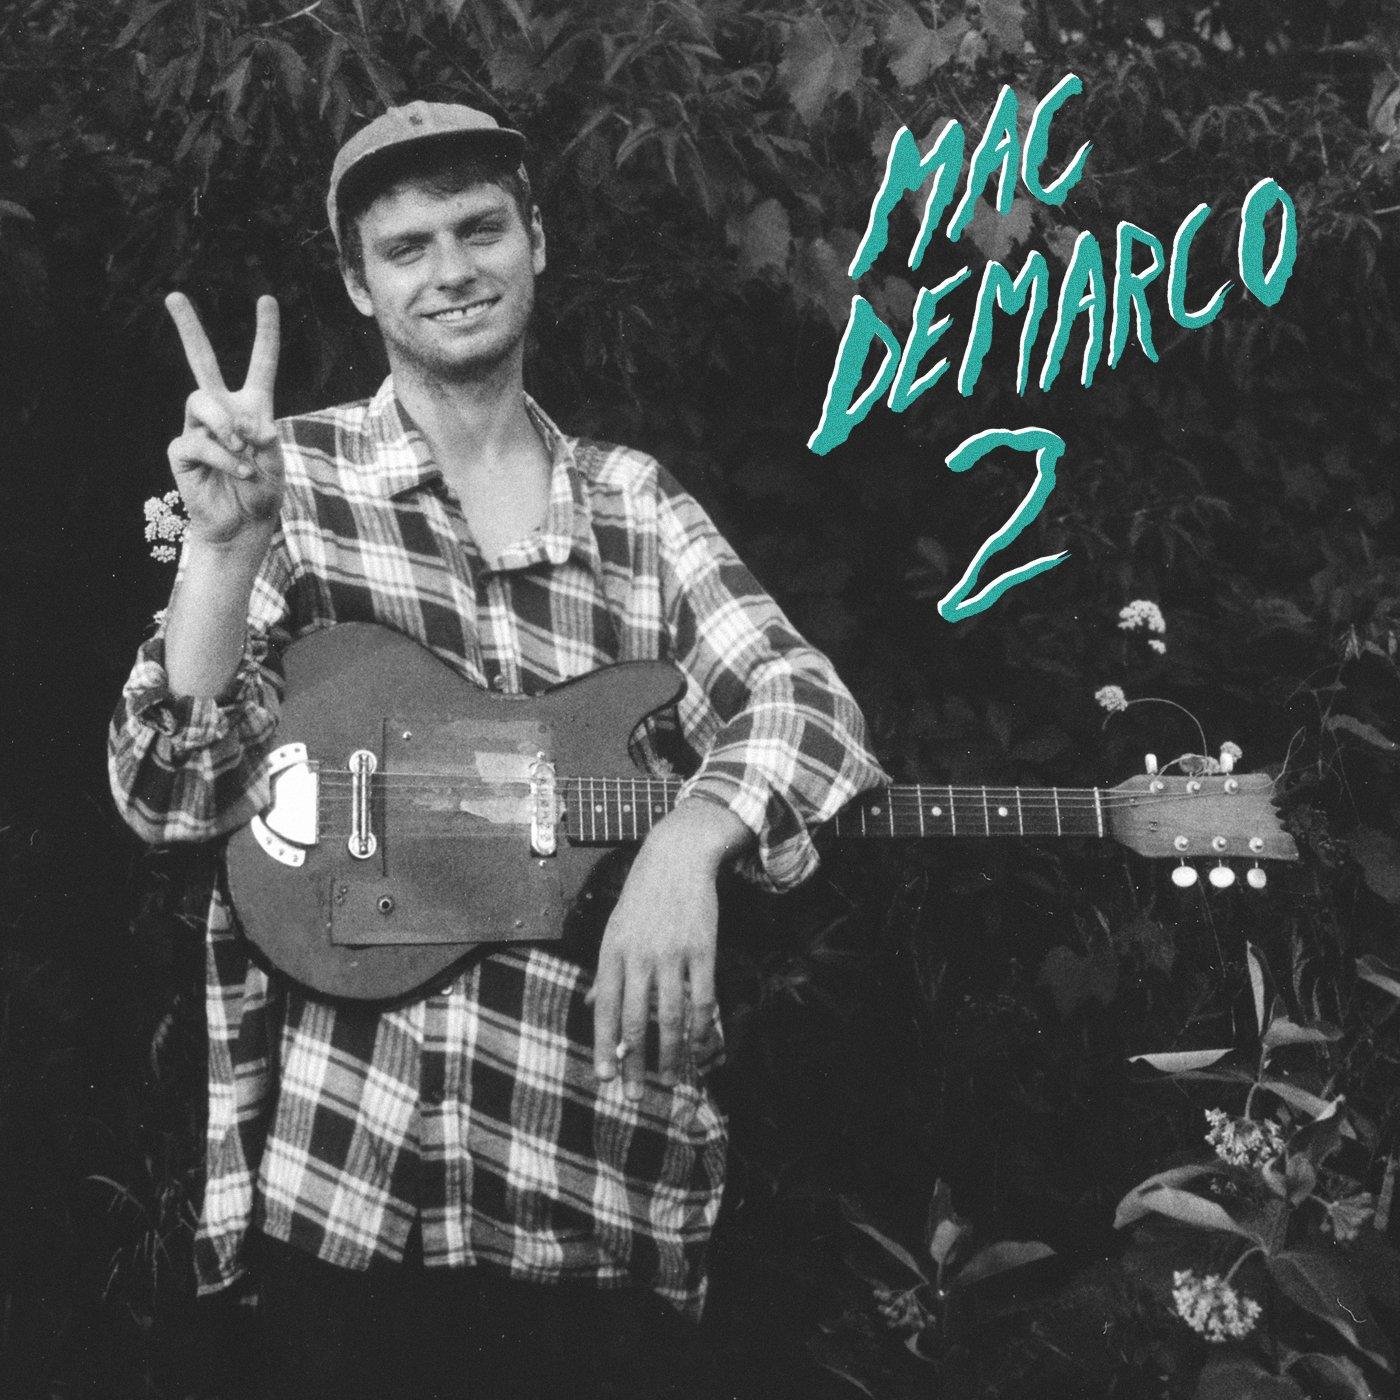 mac demarco 2 amazon com music